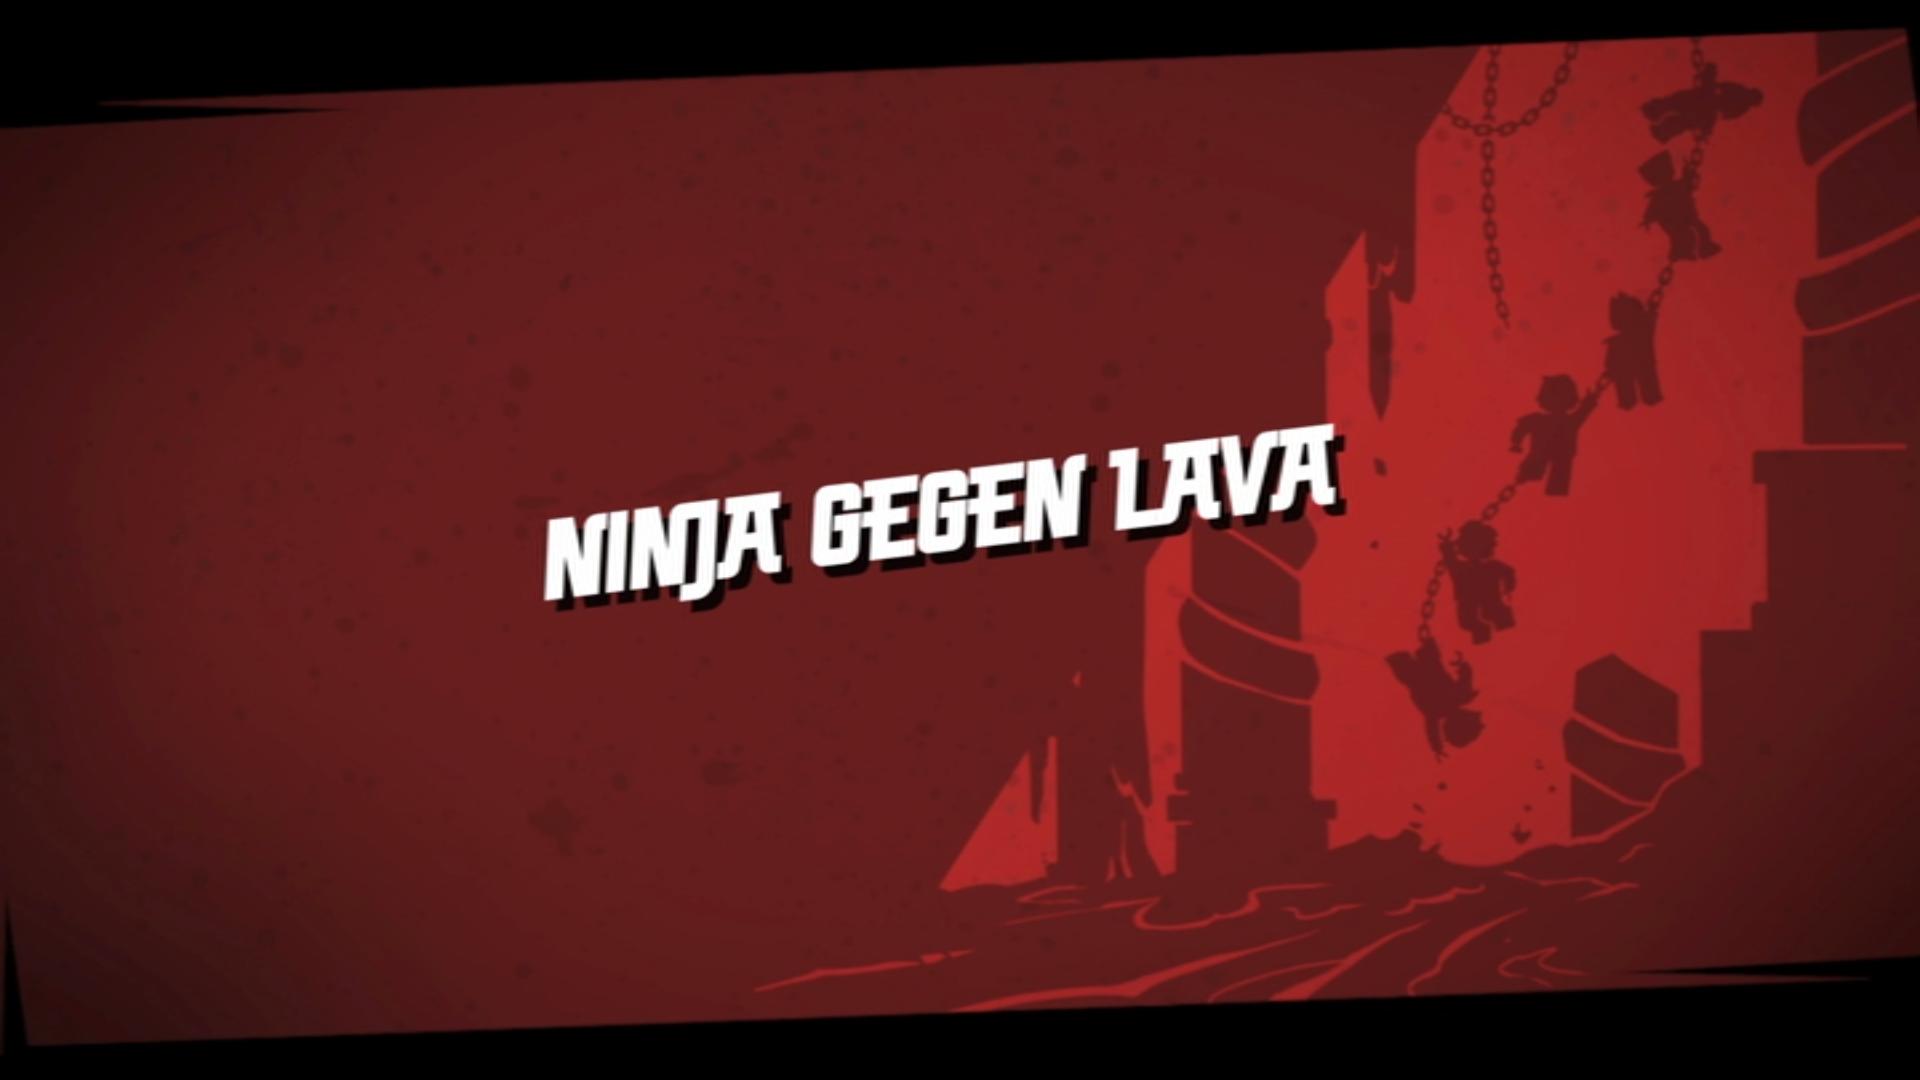 Ninja gegen Lava   Lego Ninjago Wiki